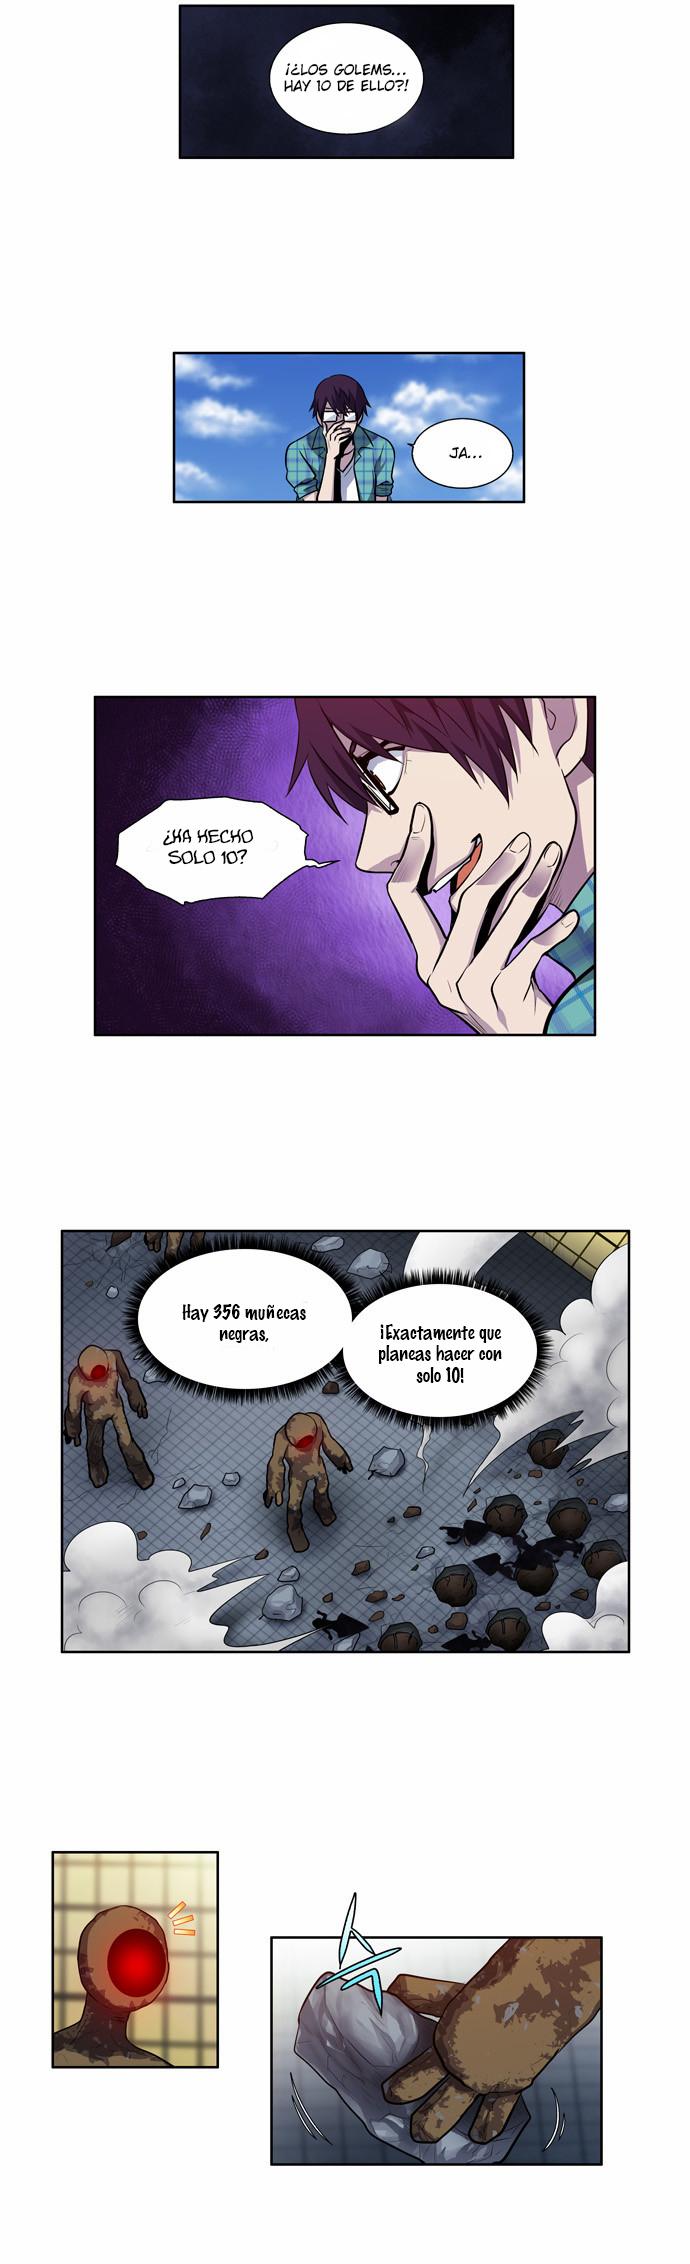 https://c5.ninemanga.com/es_manga/61/1725/439980/a797b6a1d0ad896d6ef294d668d9a0c0.jpg Page 3